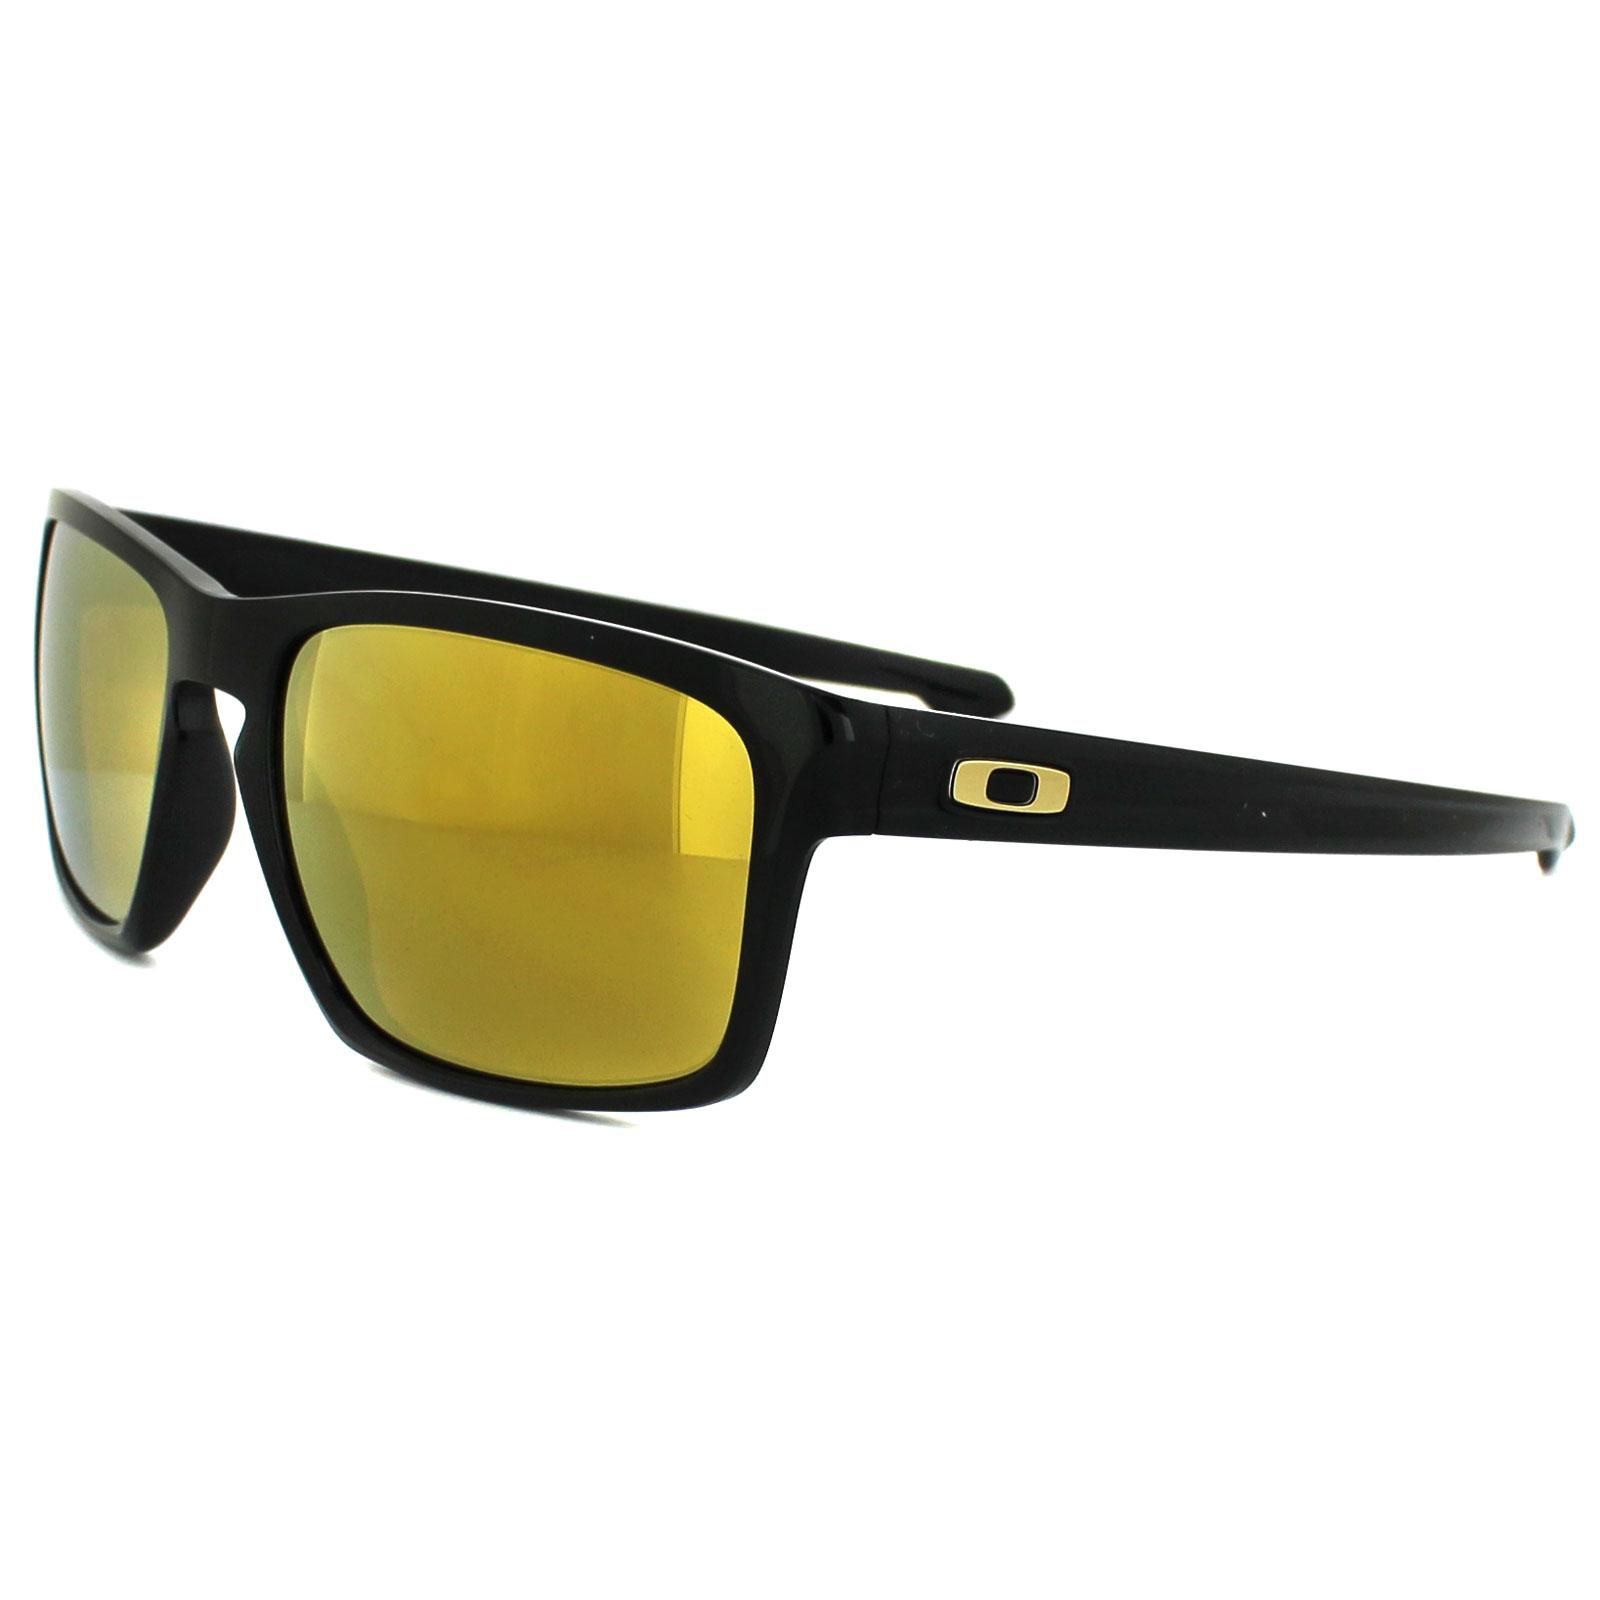 Cheap Oakley Sliver Sunglasses Discounted Sunglasses